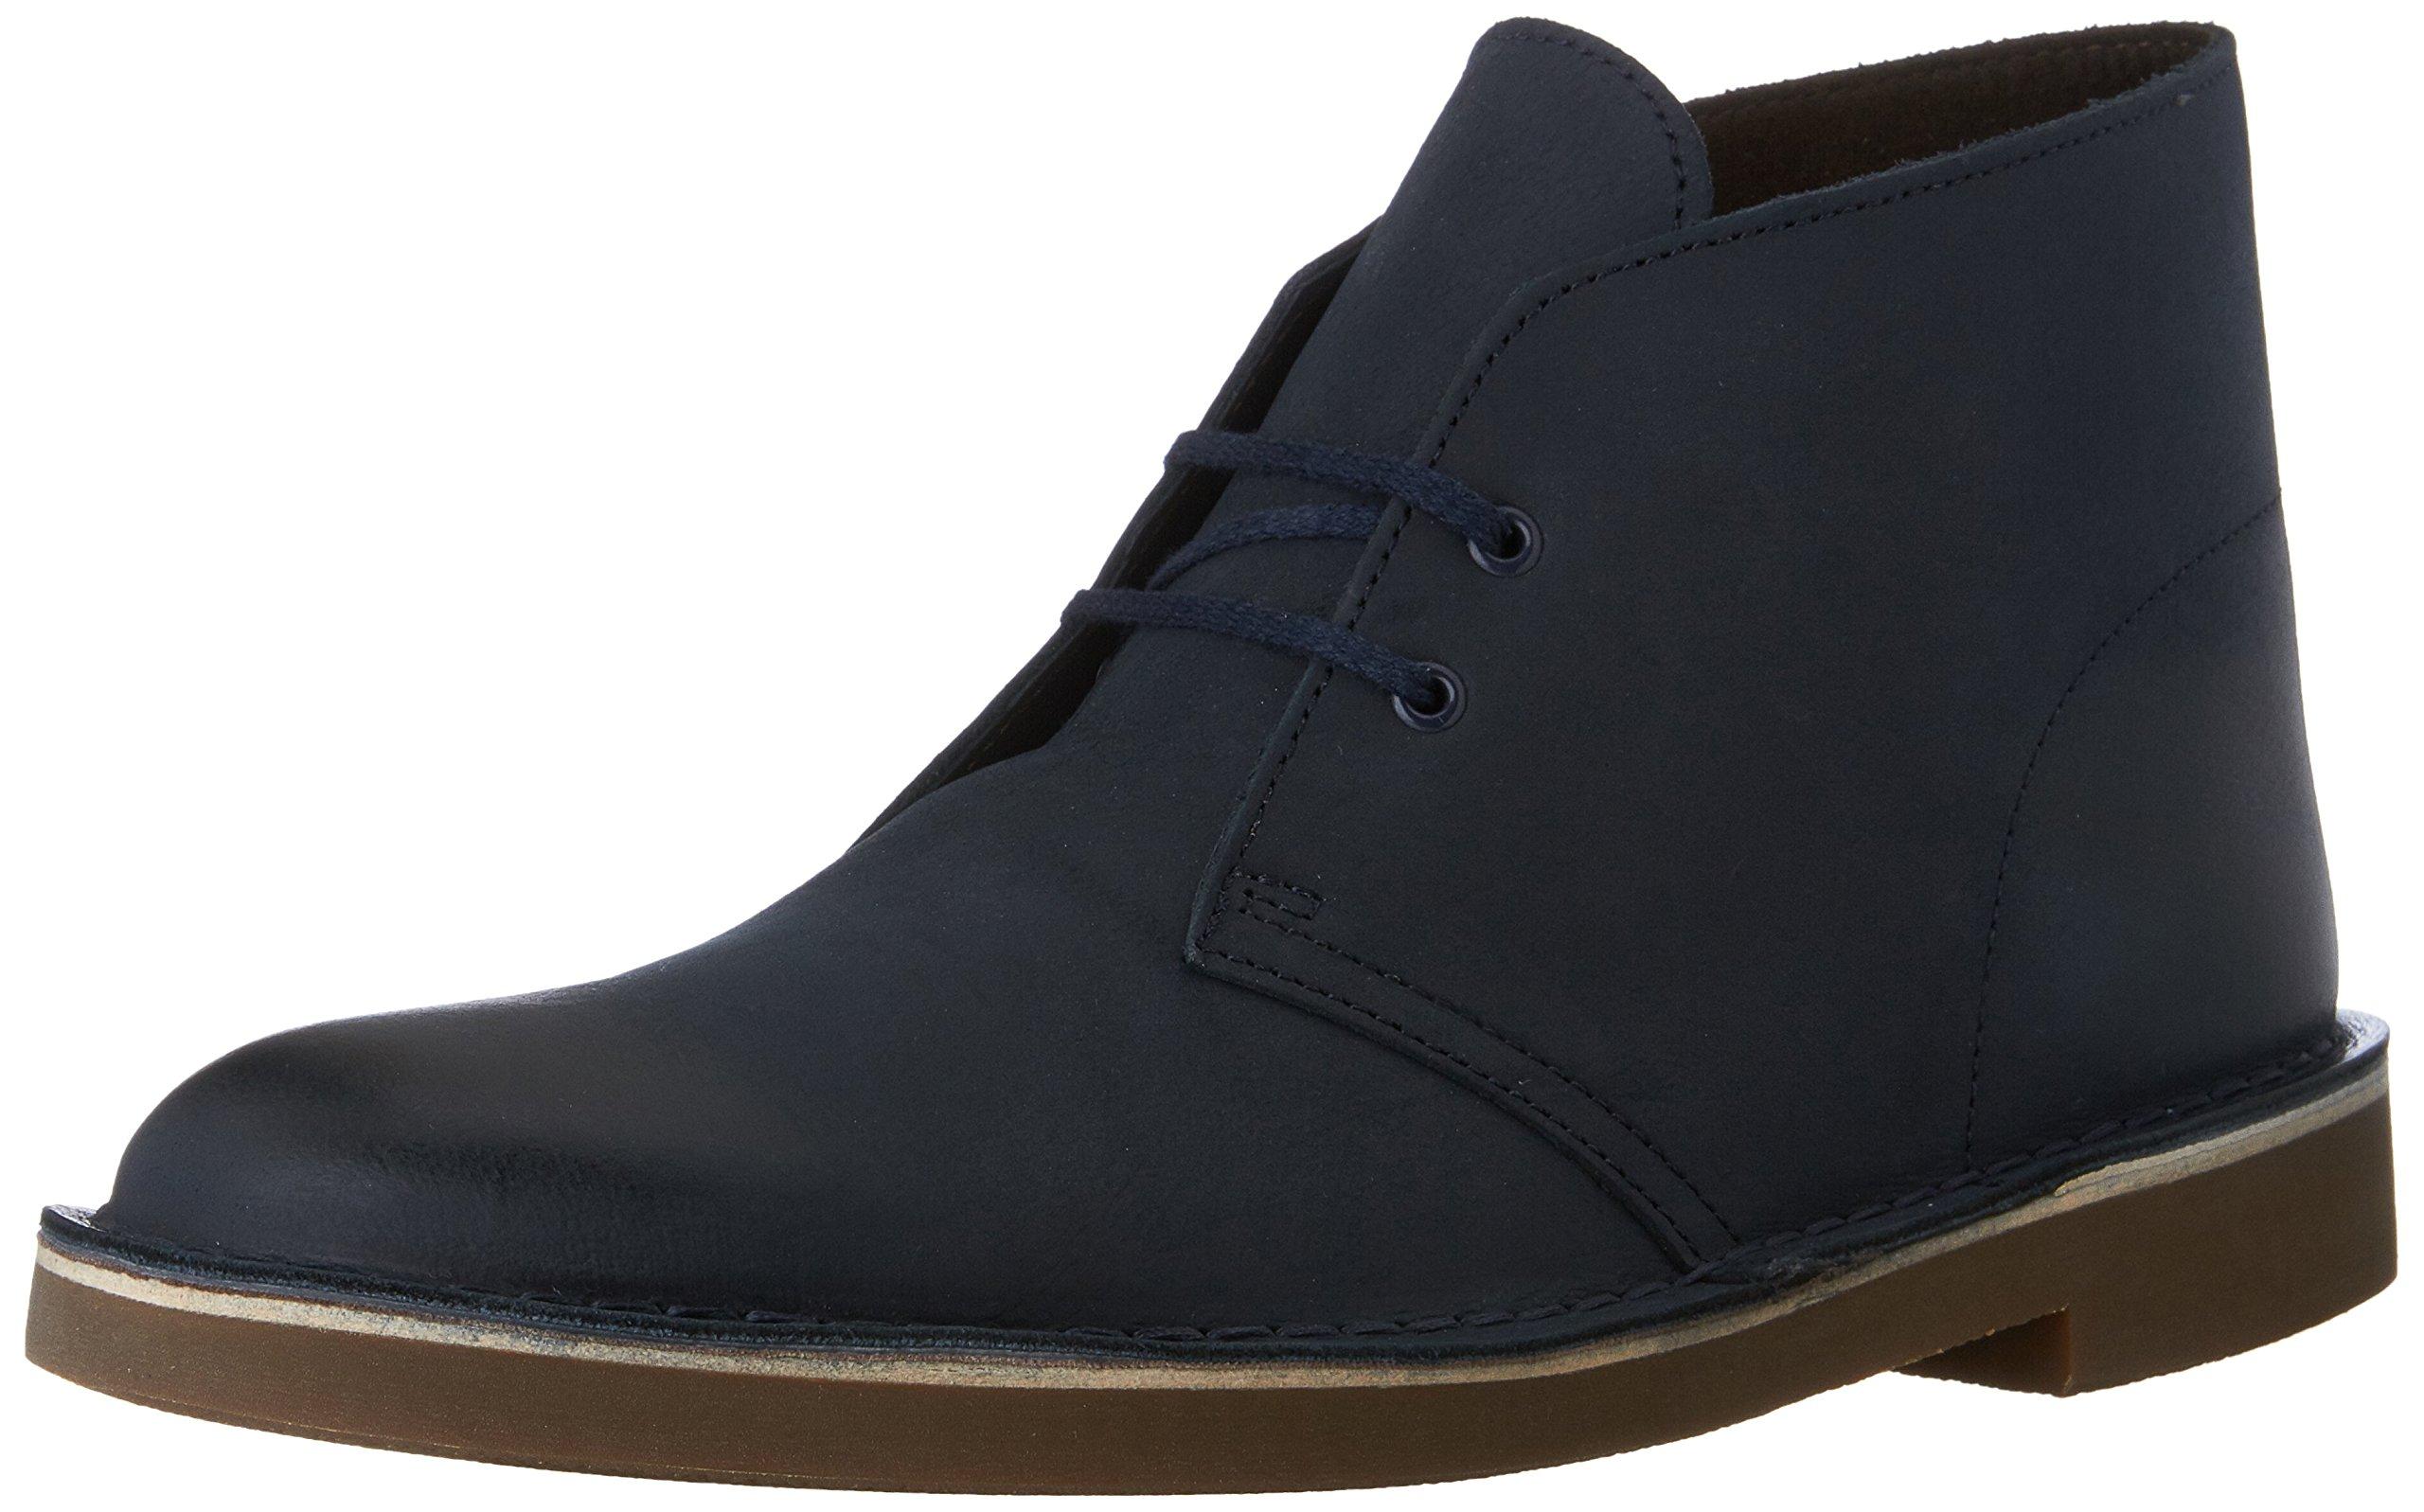 Clarks Men's Bushacre 2 Chukka Boot, Navy Leather, 13 M US